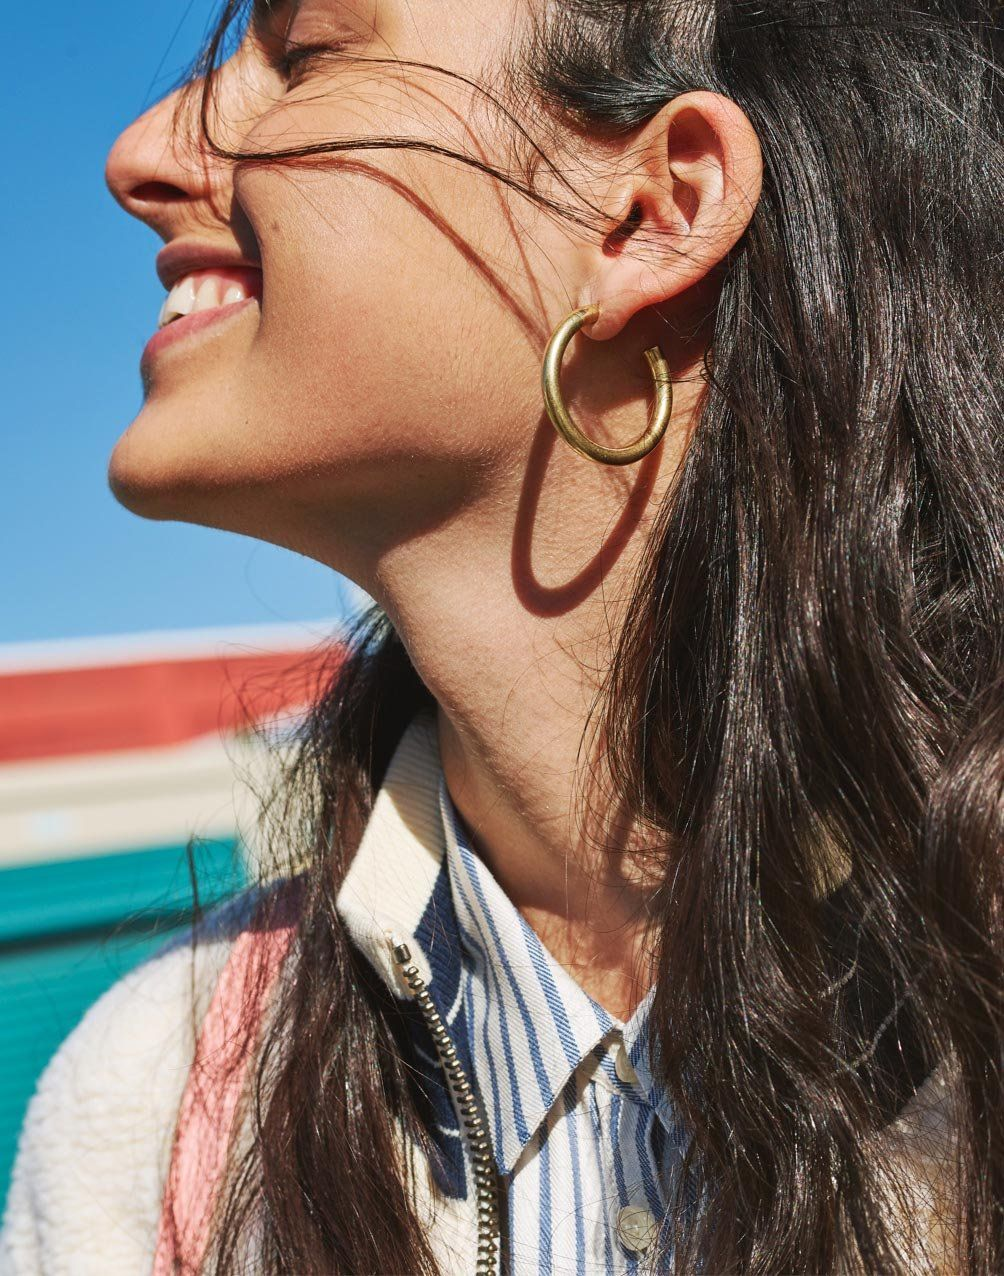 eeb13e1bb95663 madewell chunky medium hoop earrings worn with sherpa varsity bomber jacket  + central shirt.